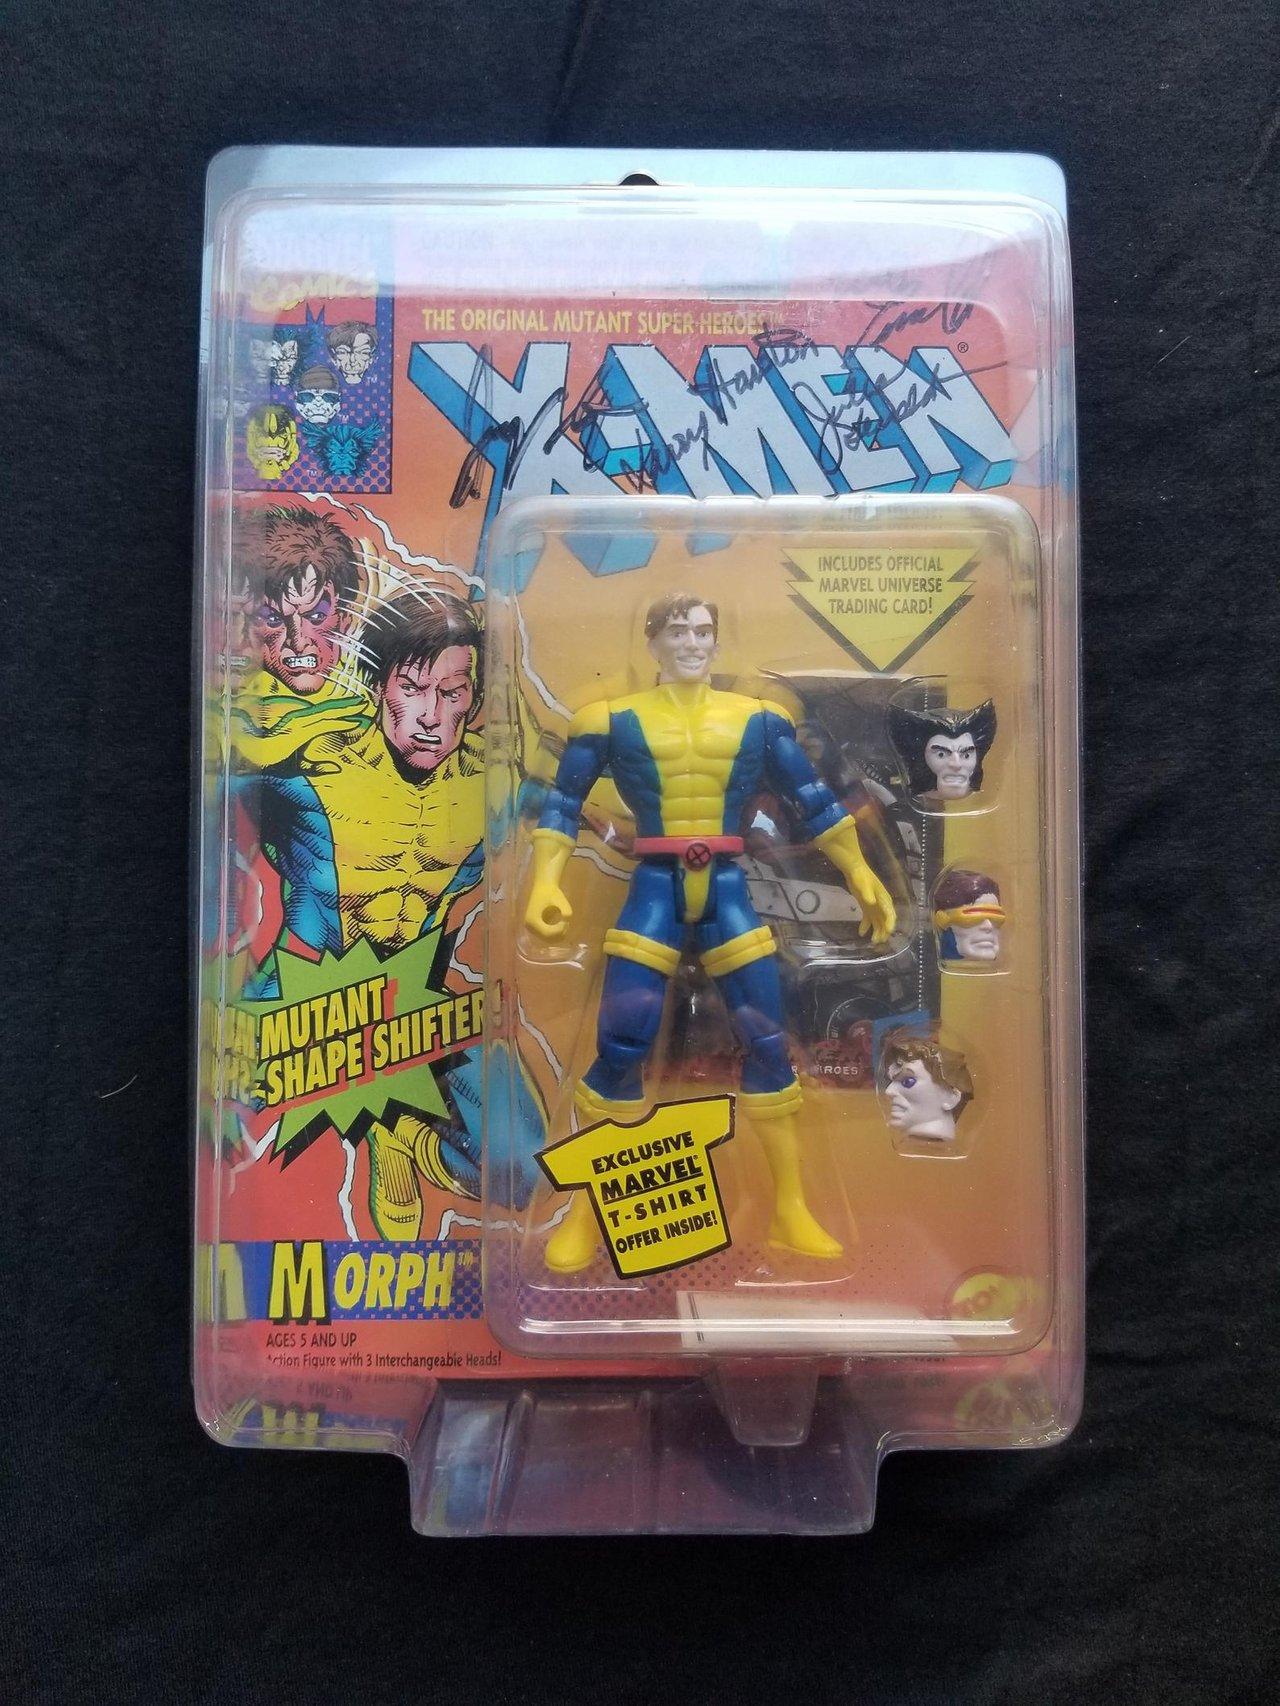 Autographed Toy Biz Morph Marvel Uncanny X-Men Vintage Signed Action Figure Animated Series New Retro Toys Collectibles 1990s Comic Books